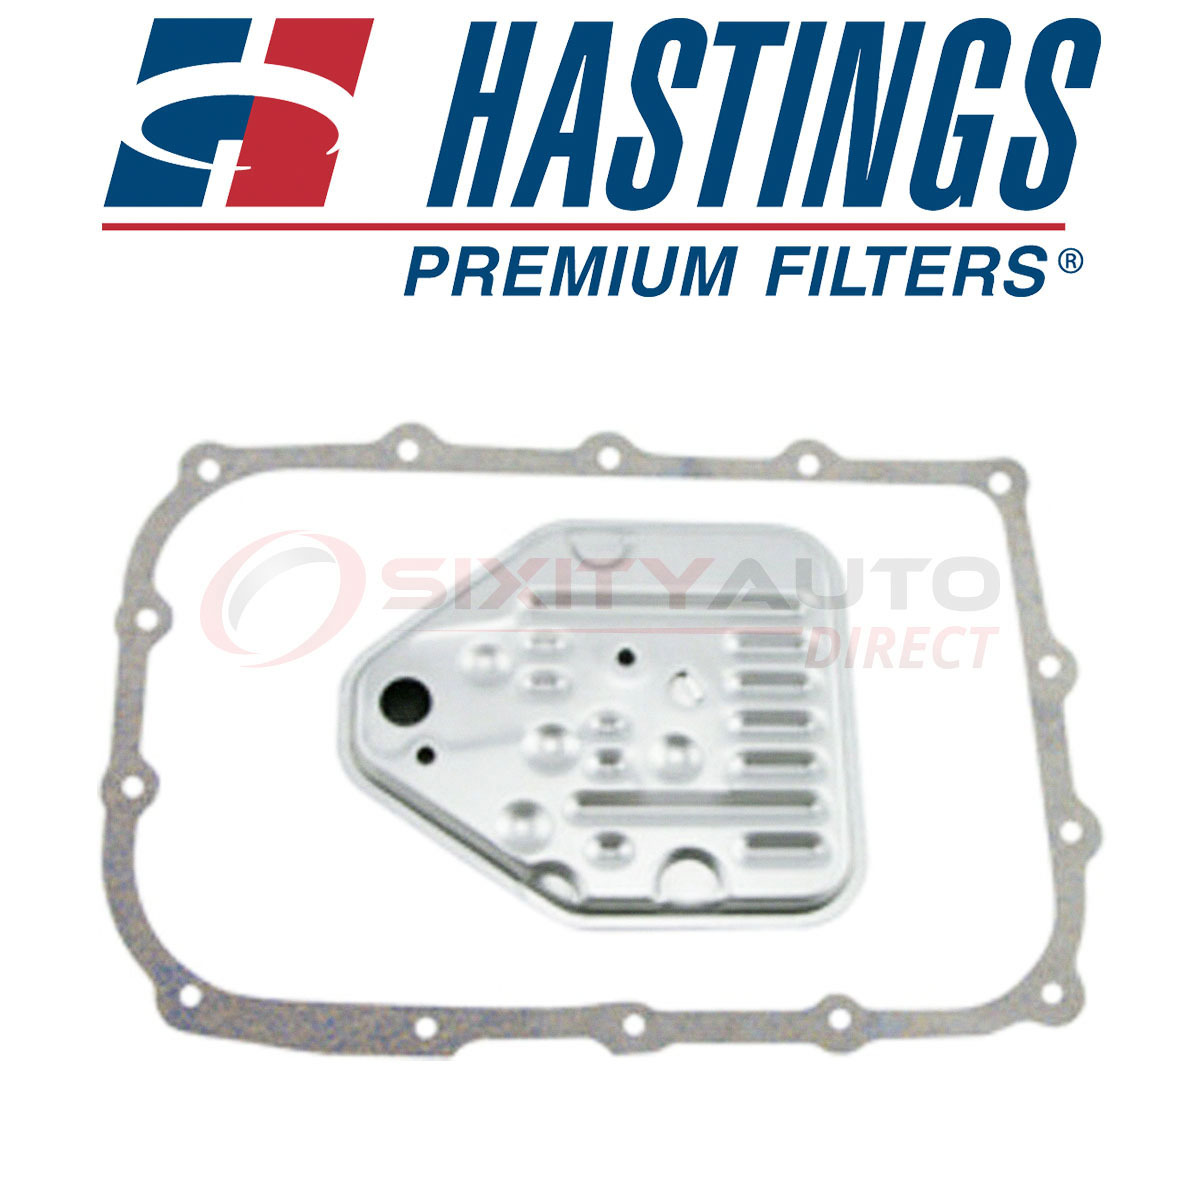 Hastings Filters TF175 Transmission Filter Kit